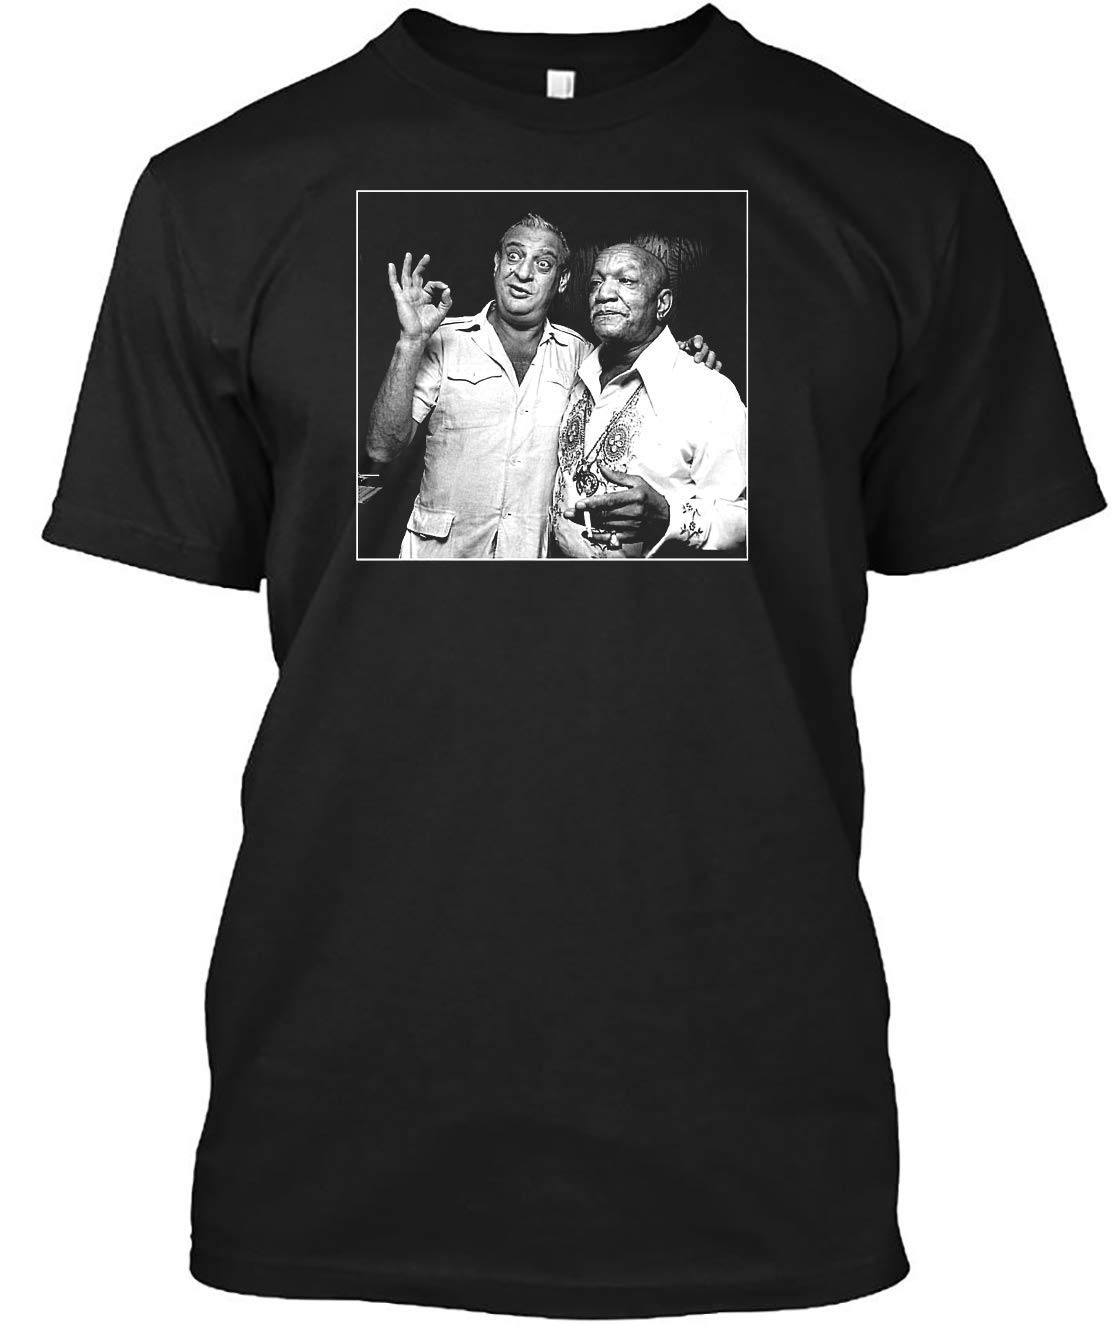 Dangerfoxx Shirt Tshirt For For